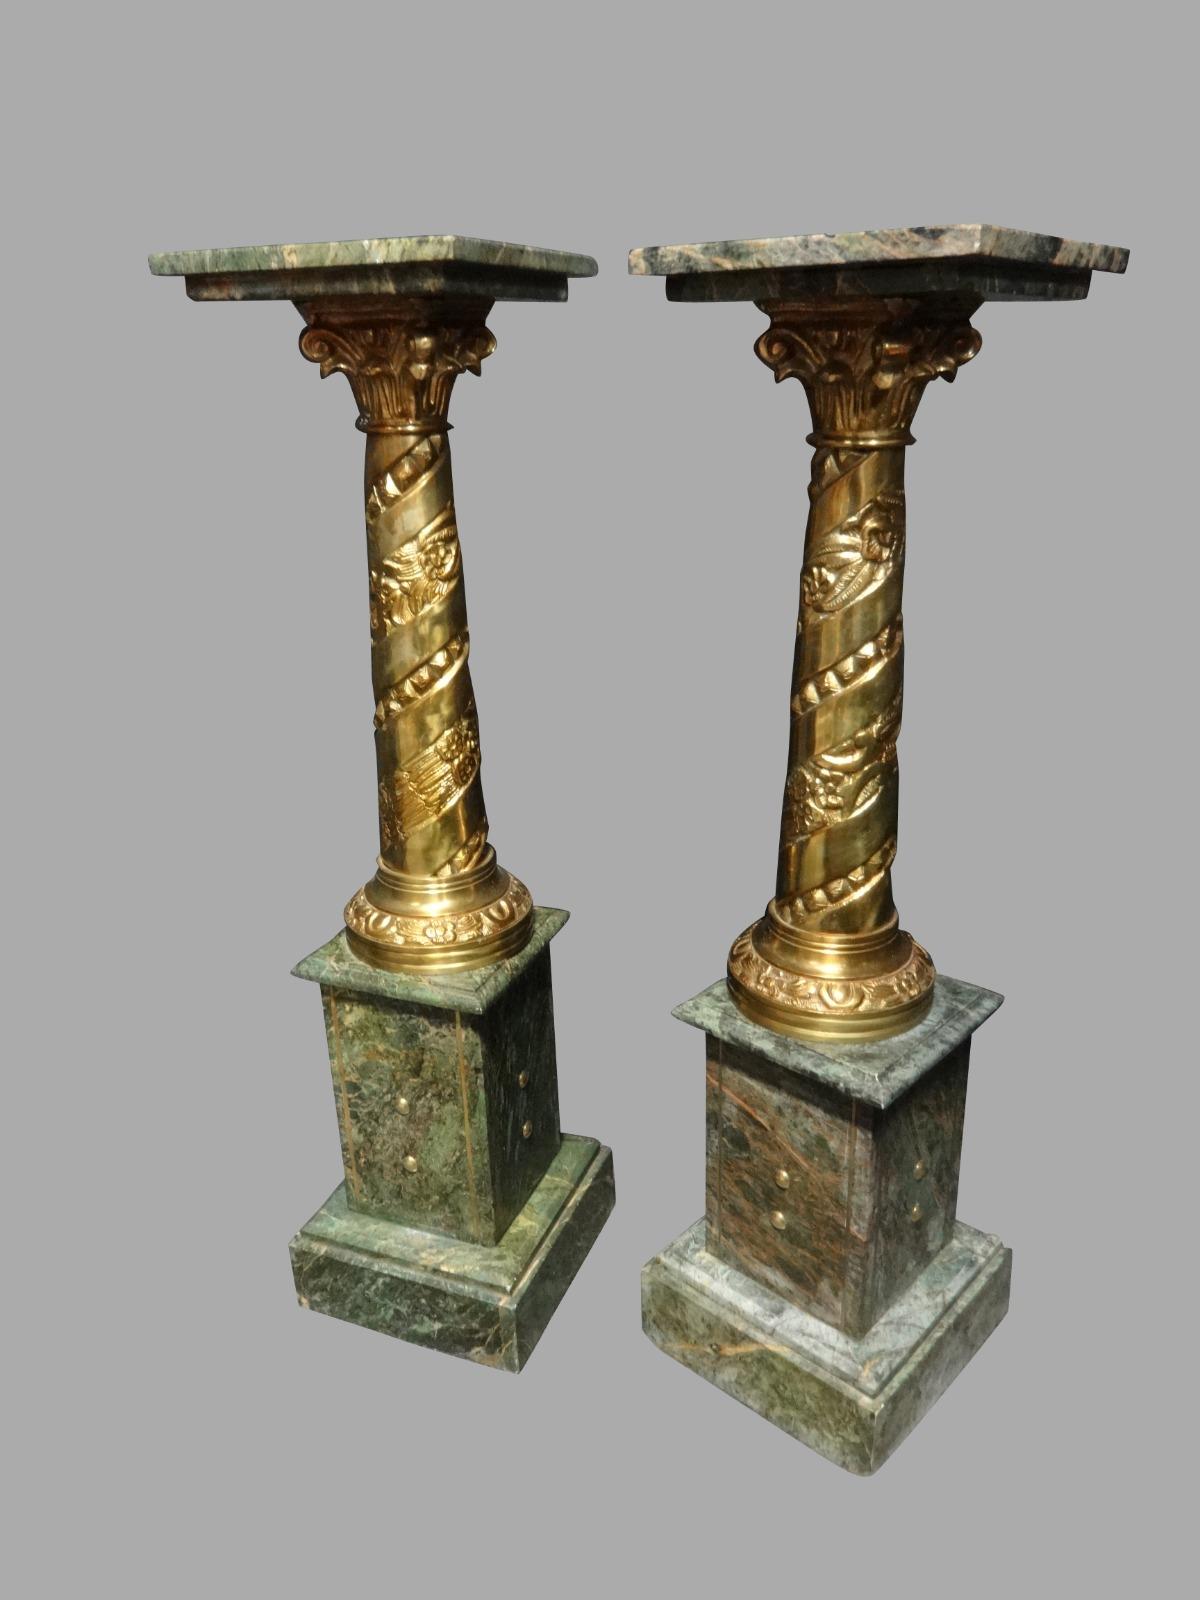 Good Pair of Green Marble & Brass Pedestals c.1920 (1 of 1)